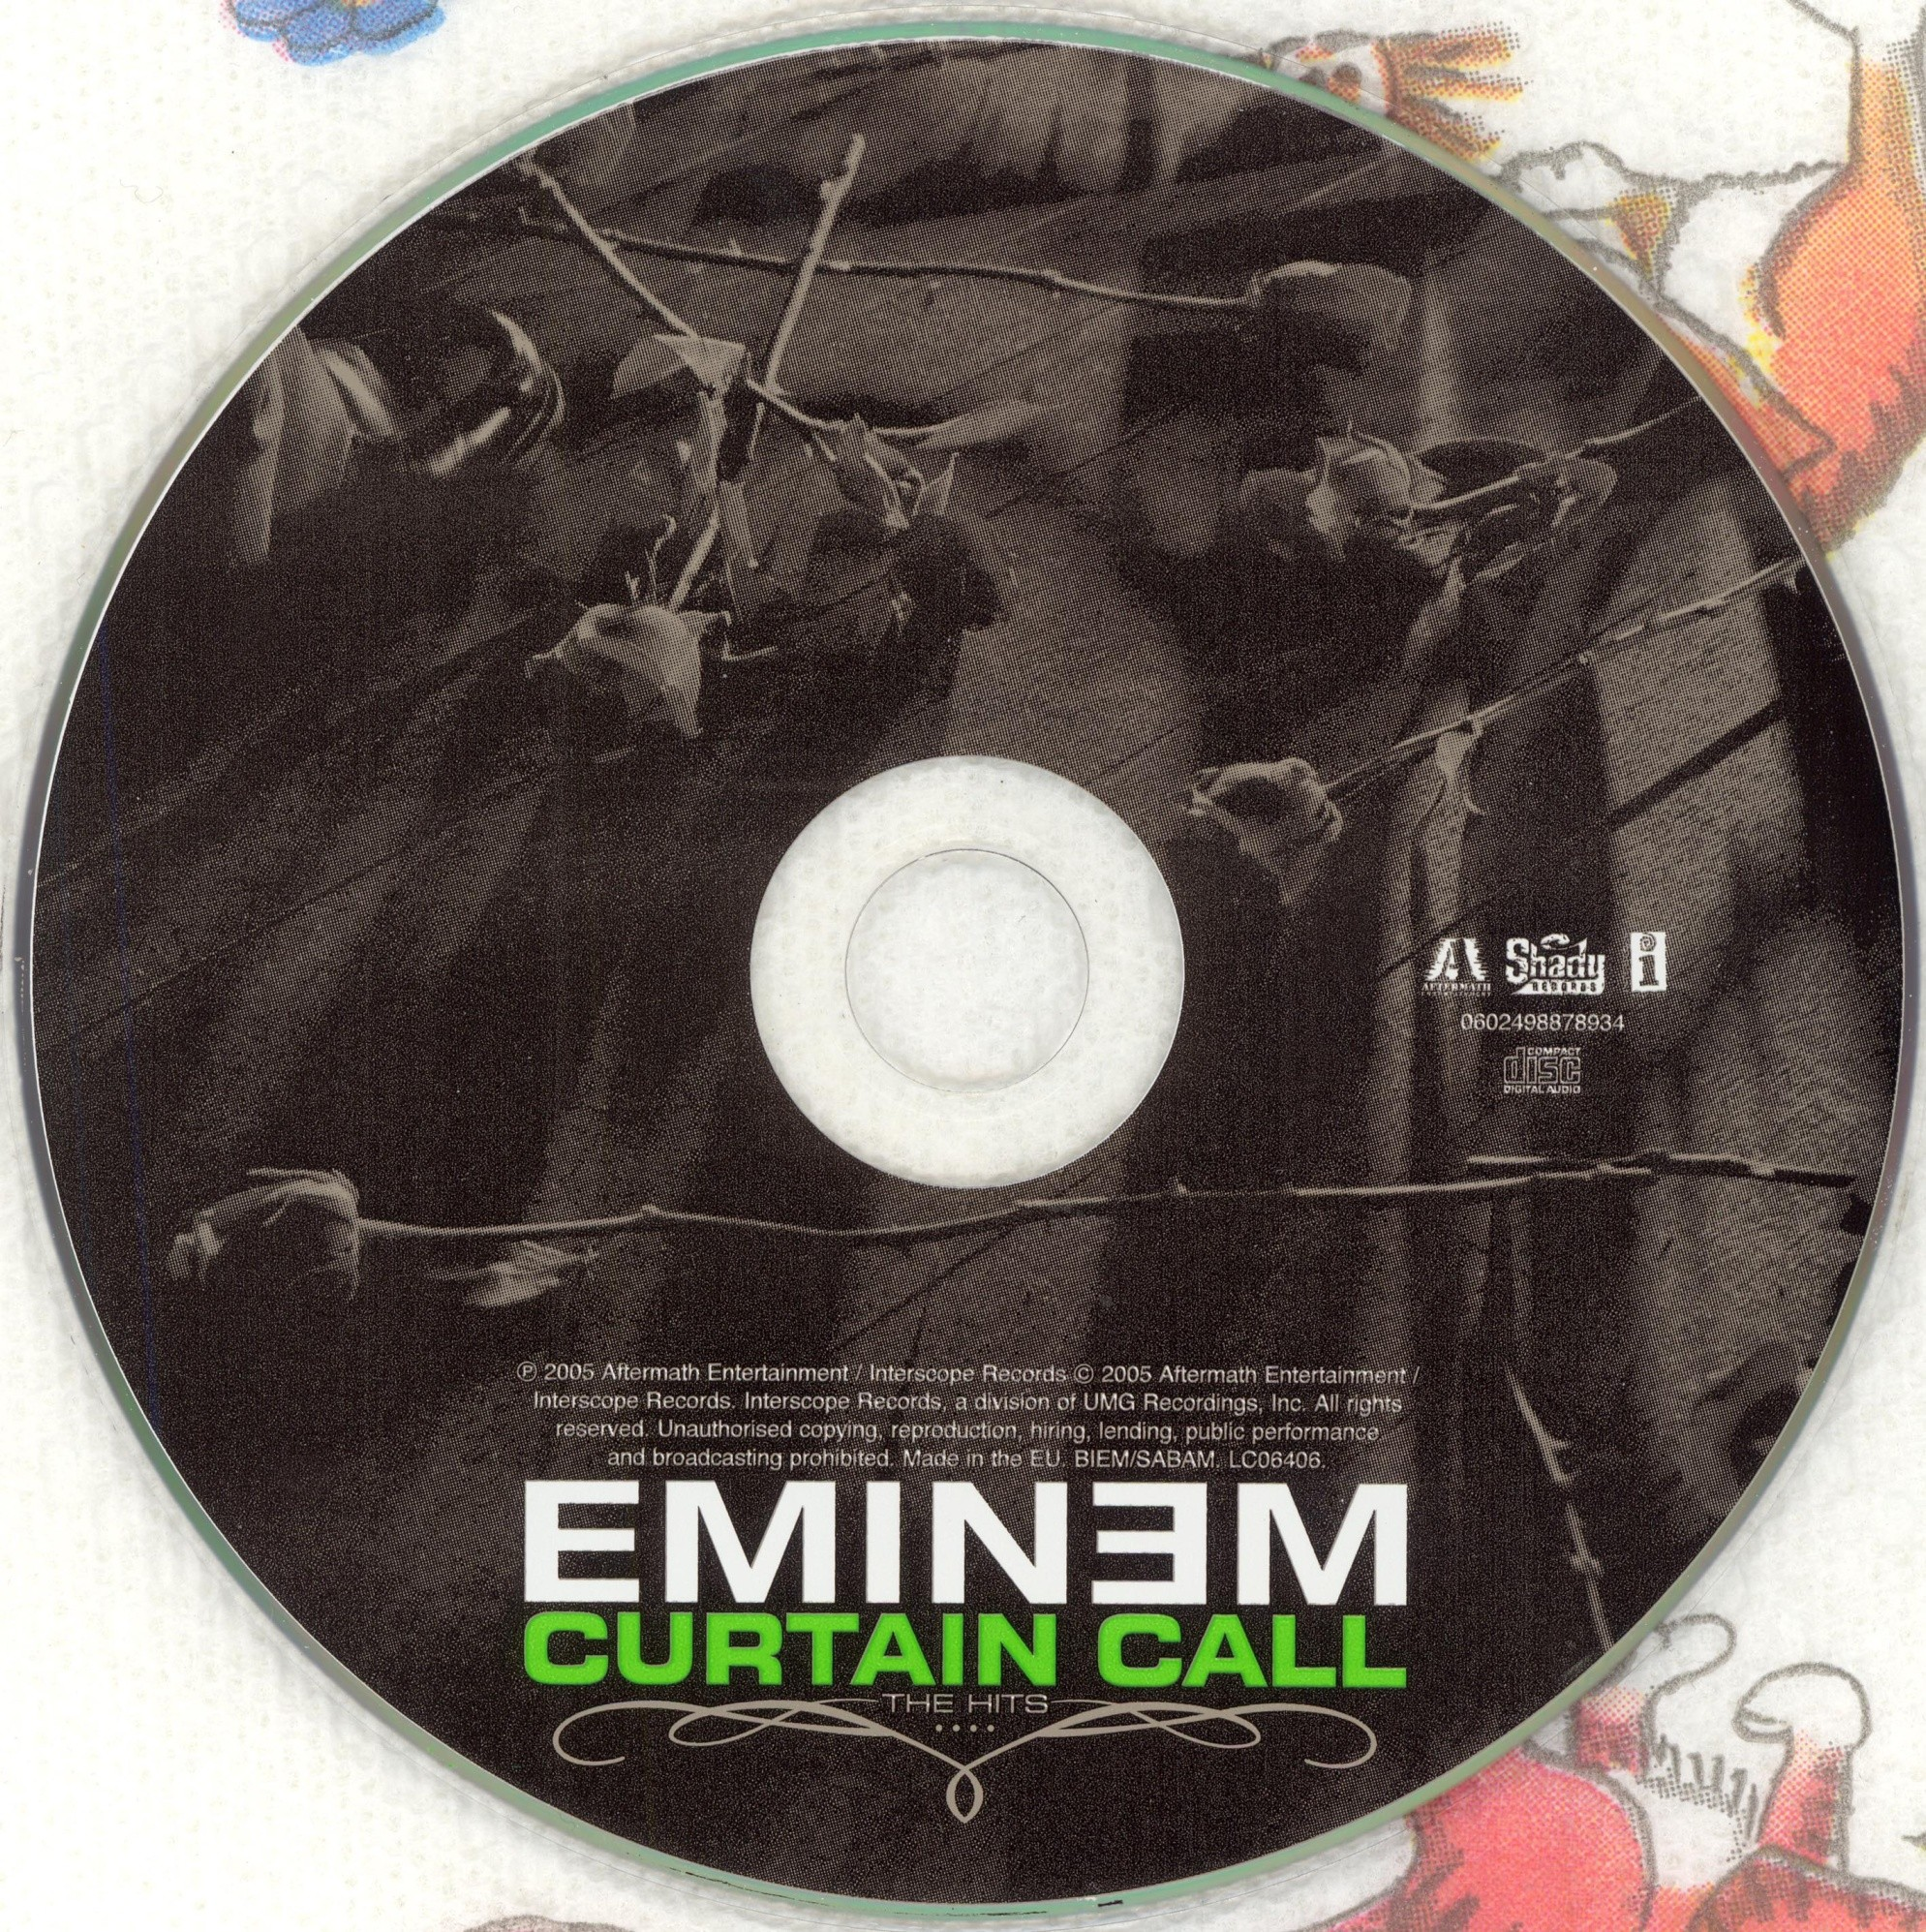 Delightful Digipak Analysis Curtain Calls The Hits Eminem A2 Media